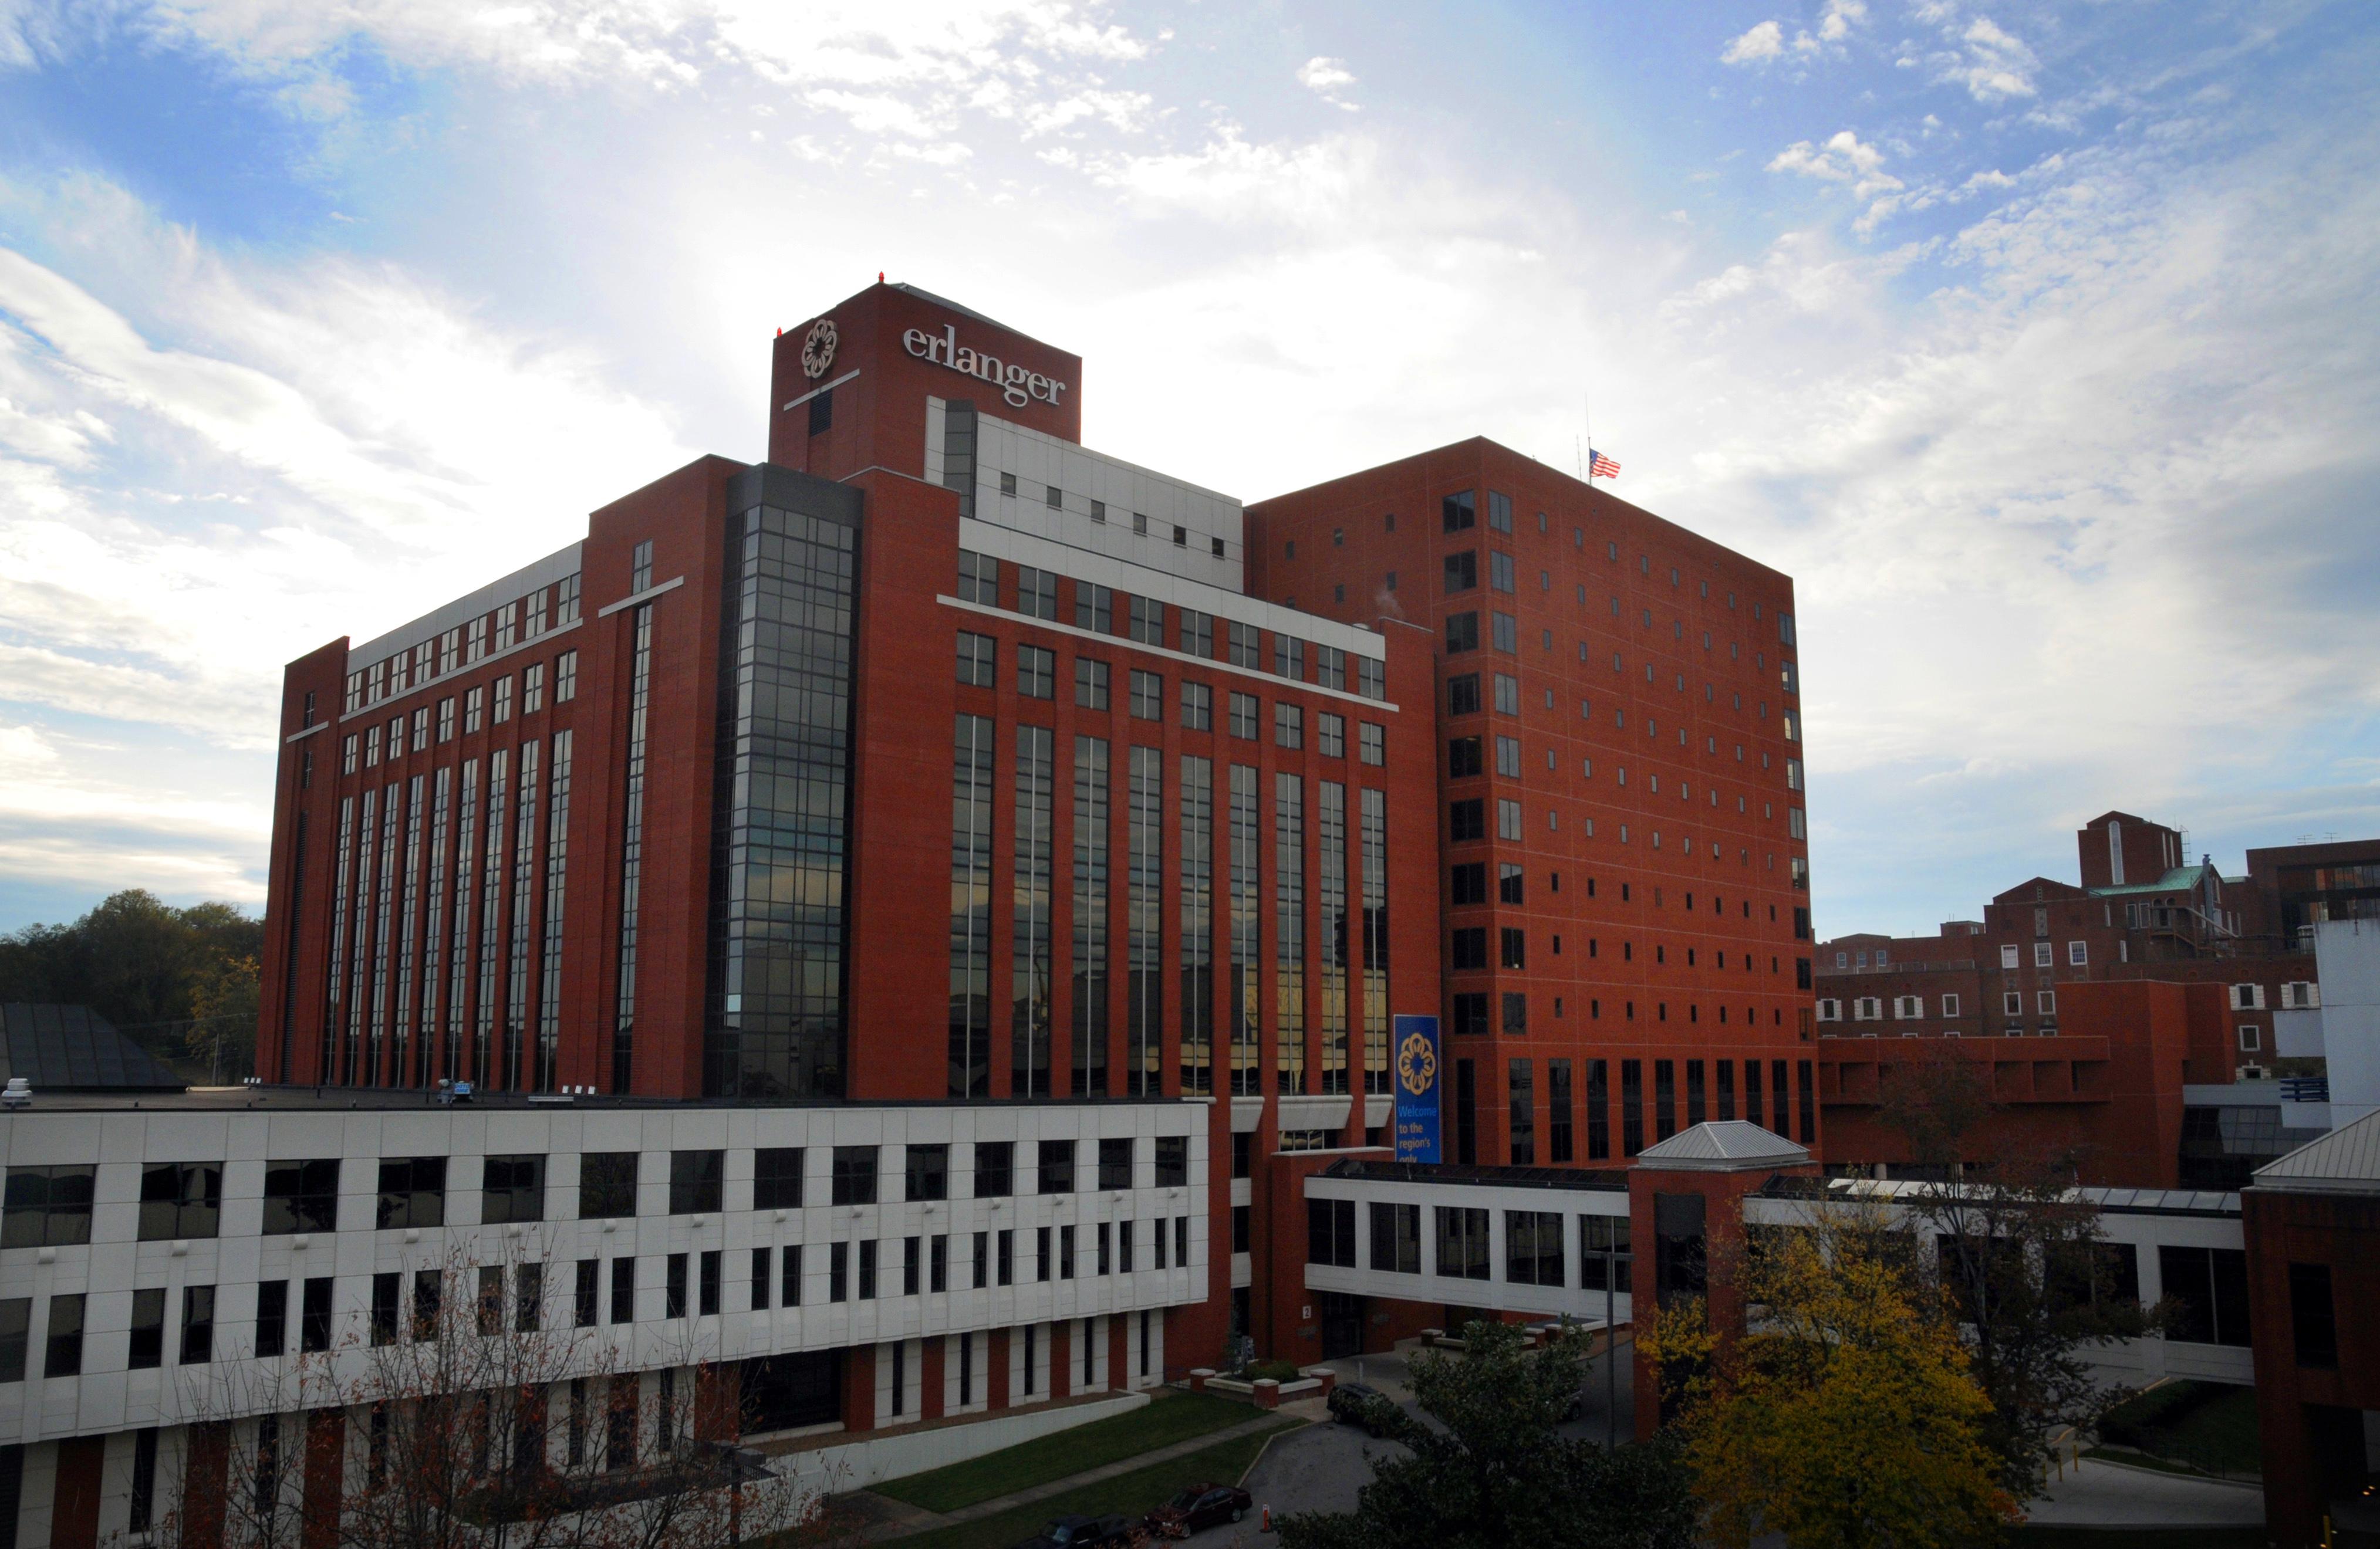 Erlanger Health System - Wikipedia